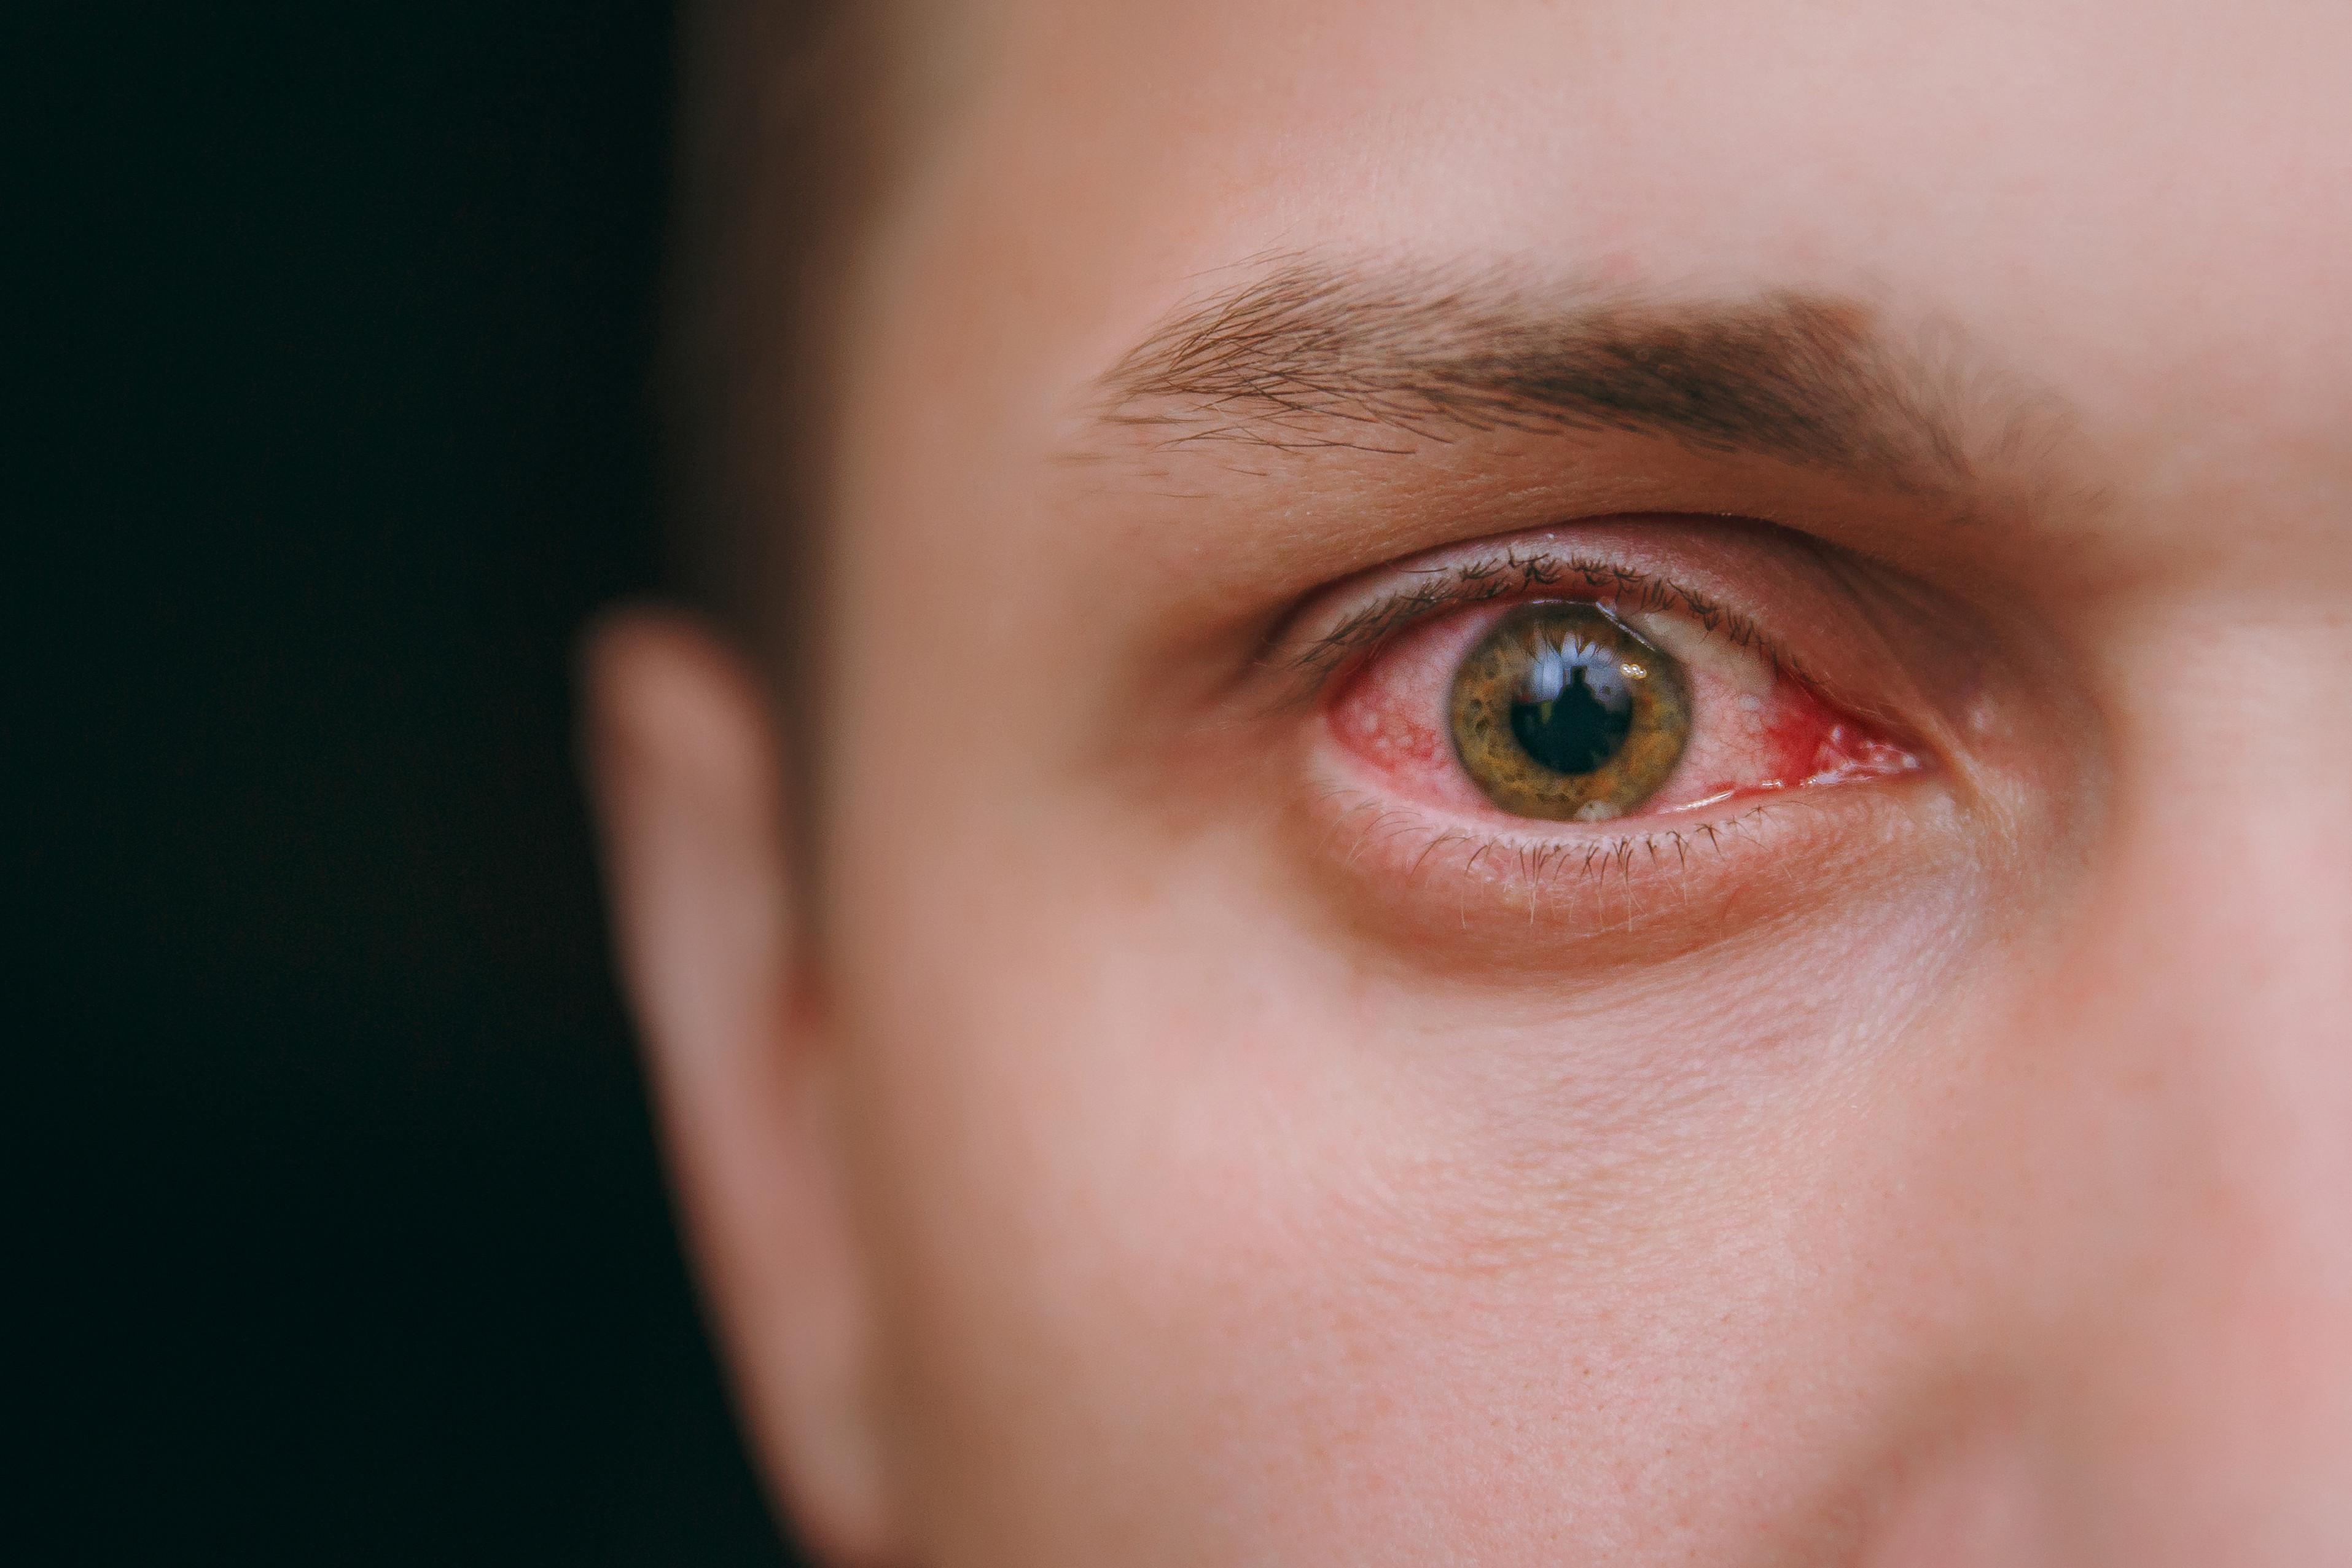 eye-infection-redness